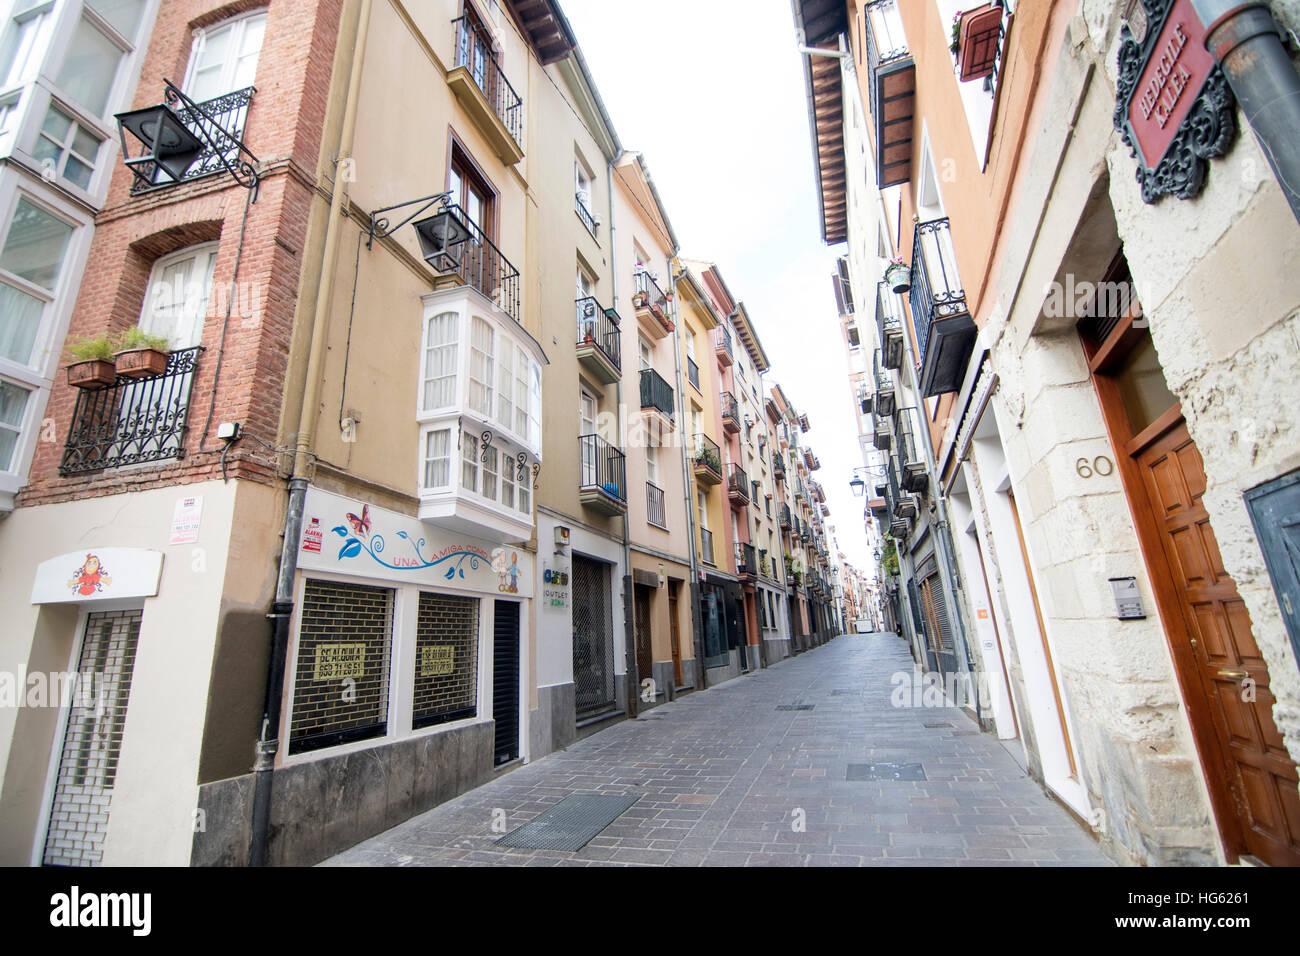 A street of Vitoria, Spain. - Stock Image